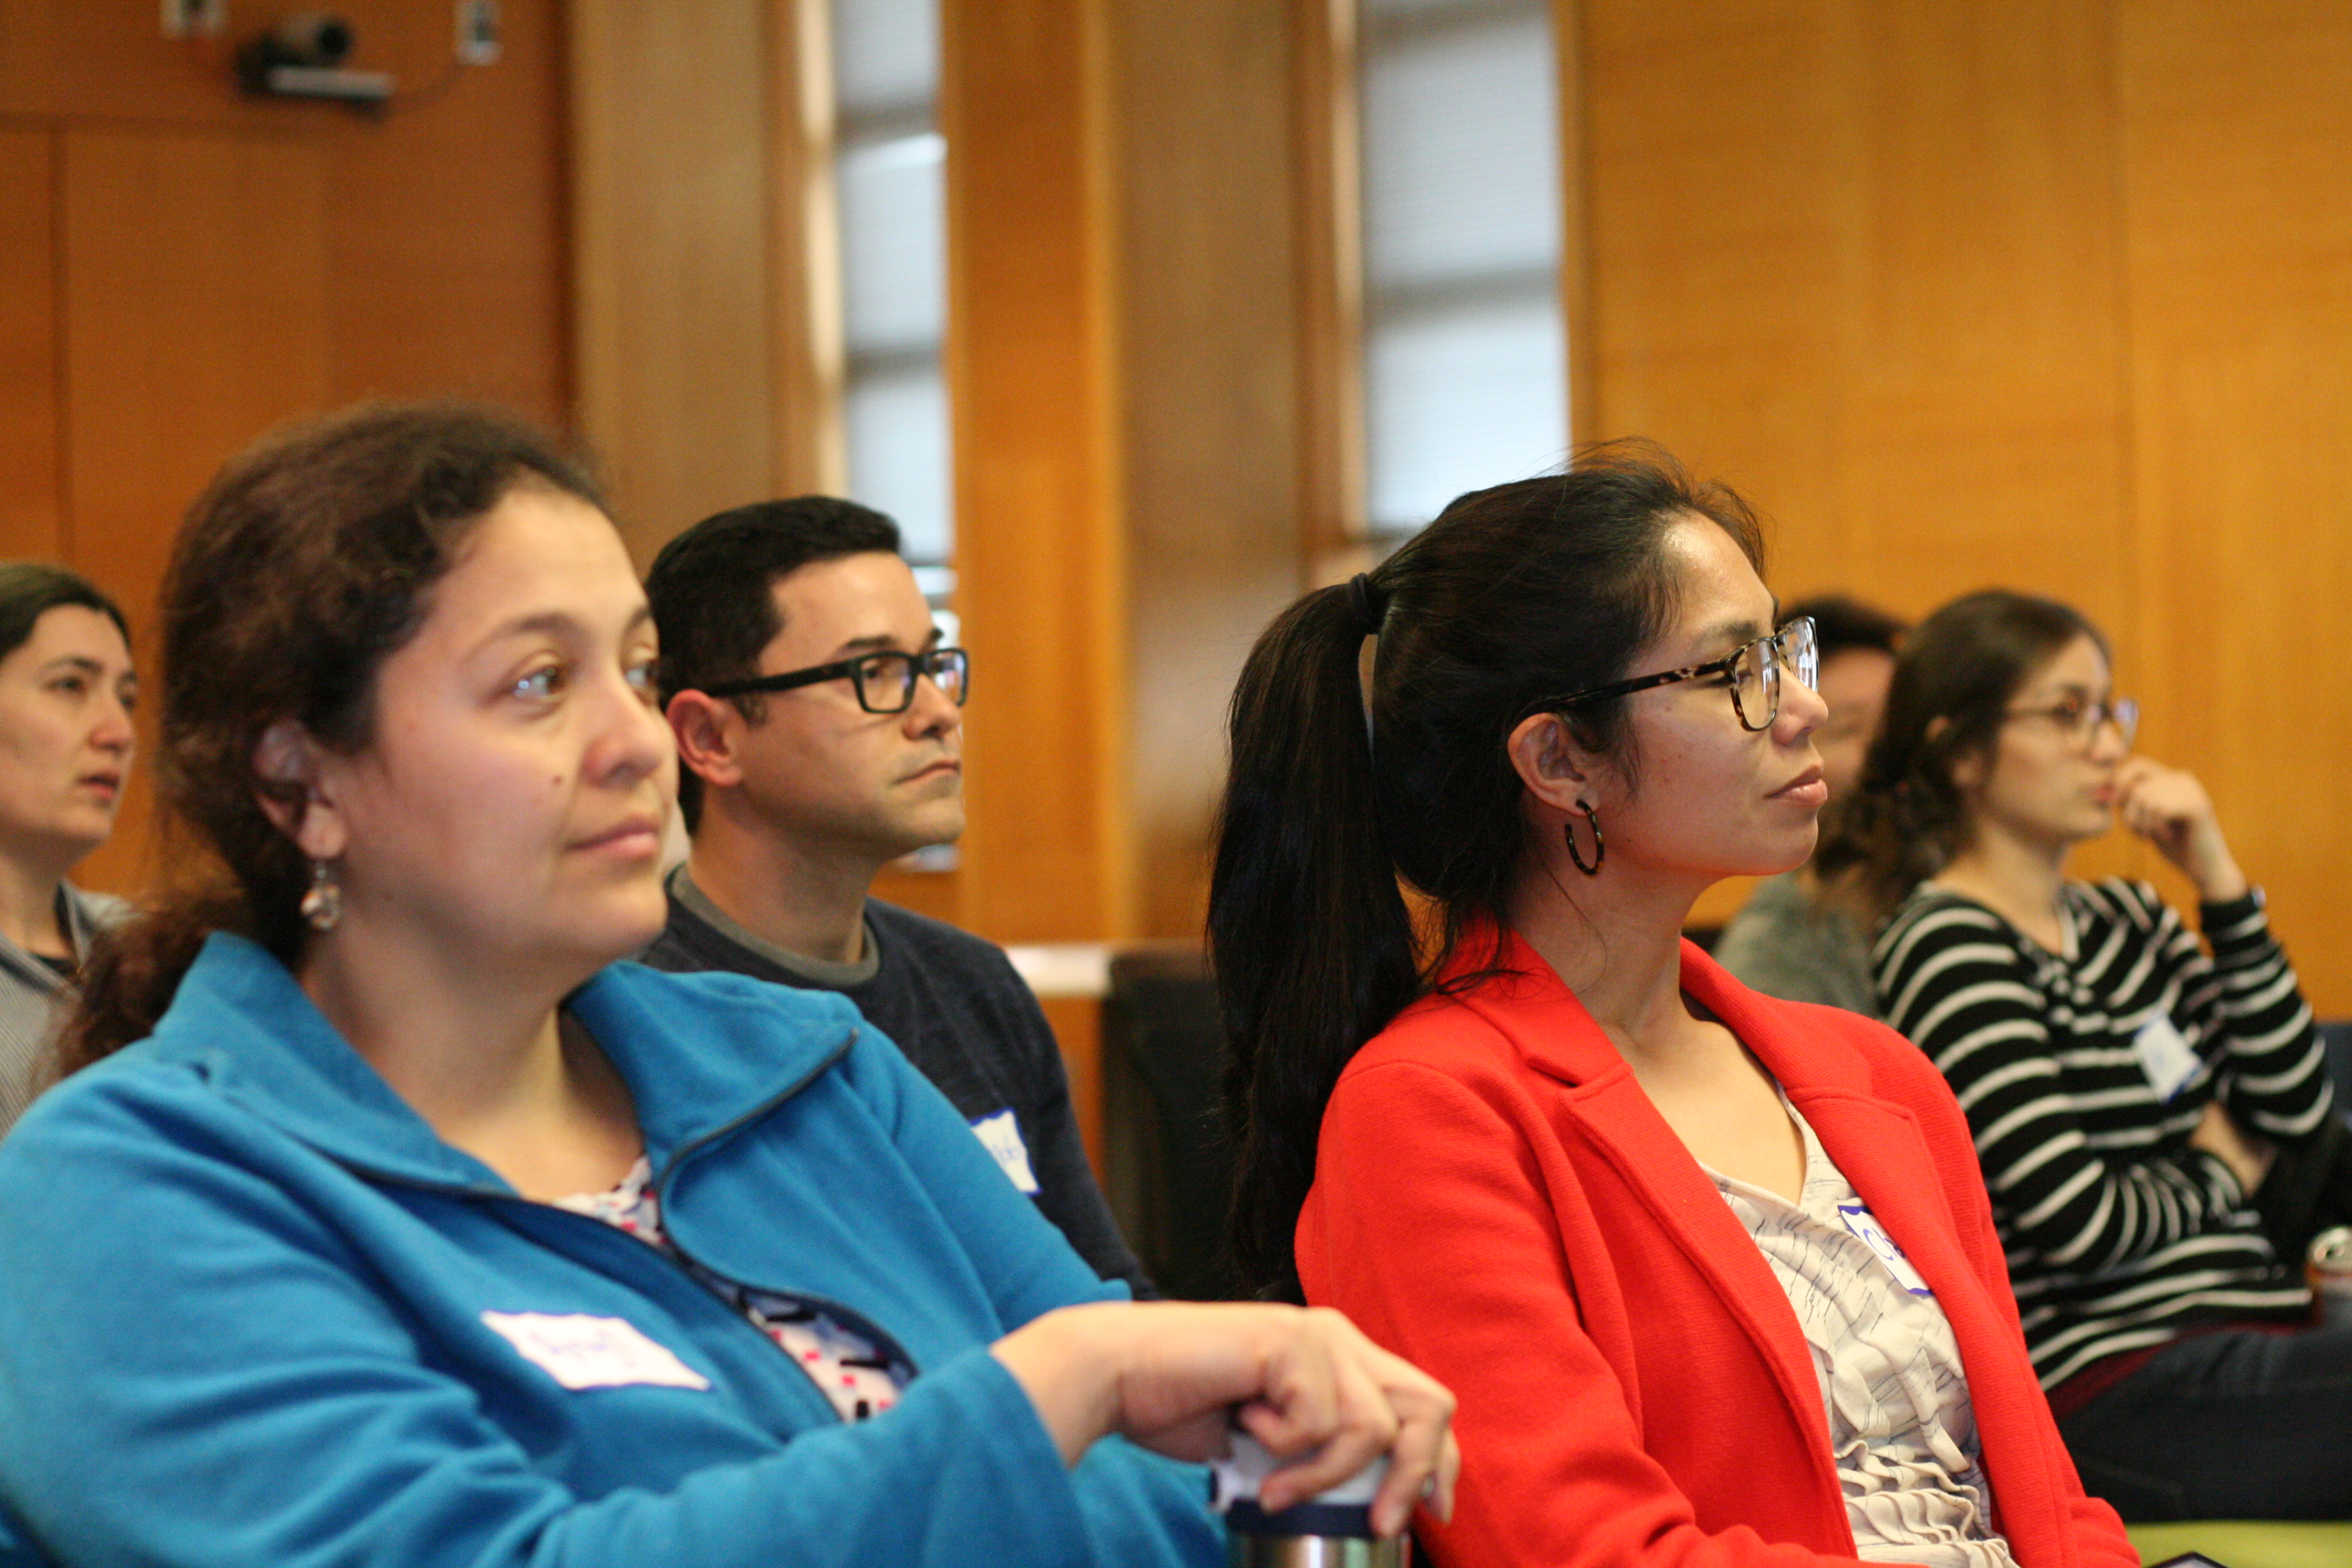 2018-2019 NextGen Professors listen to a presentation